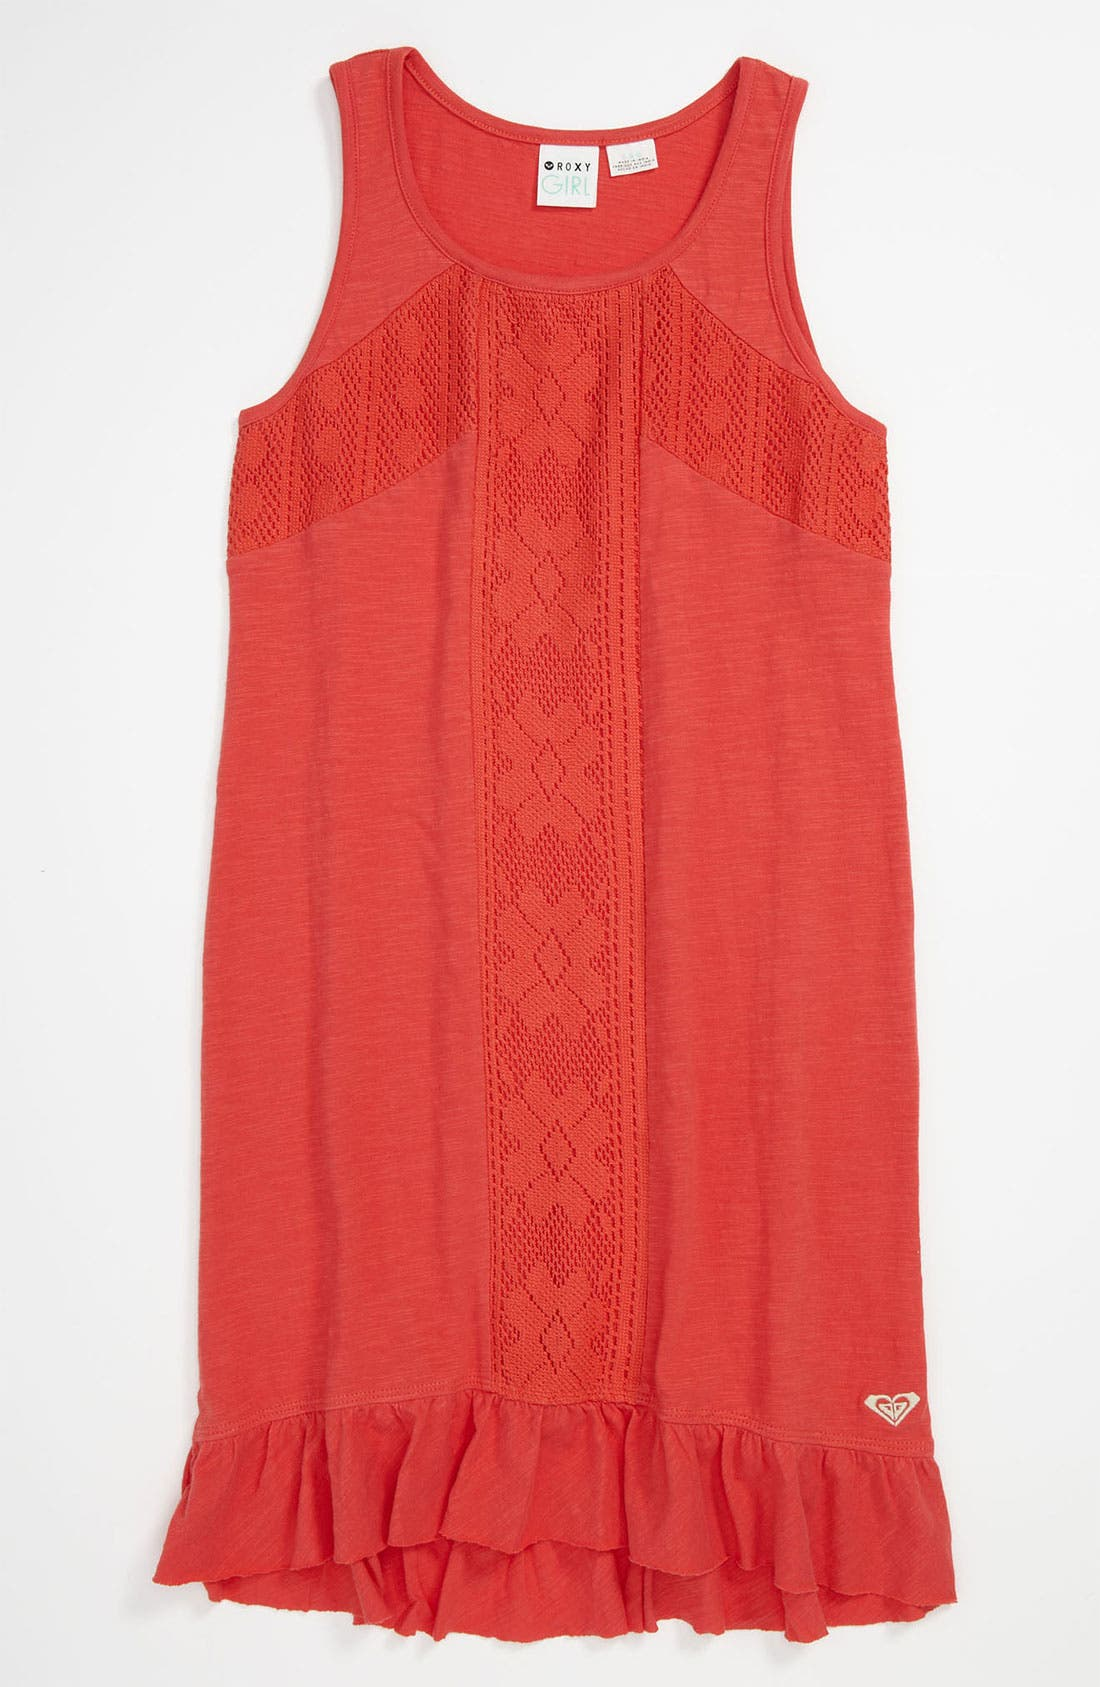 Alternate Image 1 Selected - Crochet Inset Tank Dress (Big Girls)